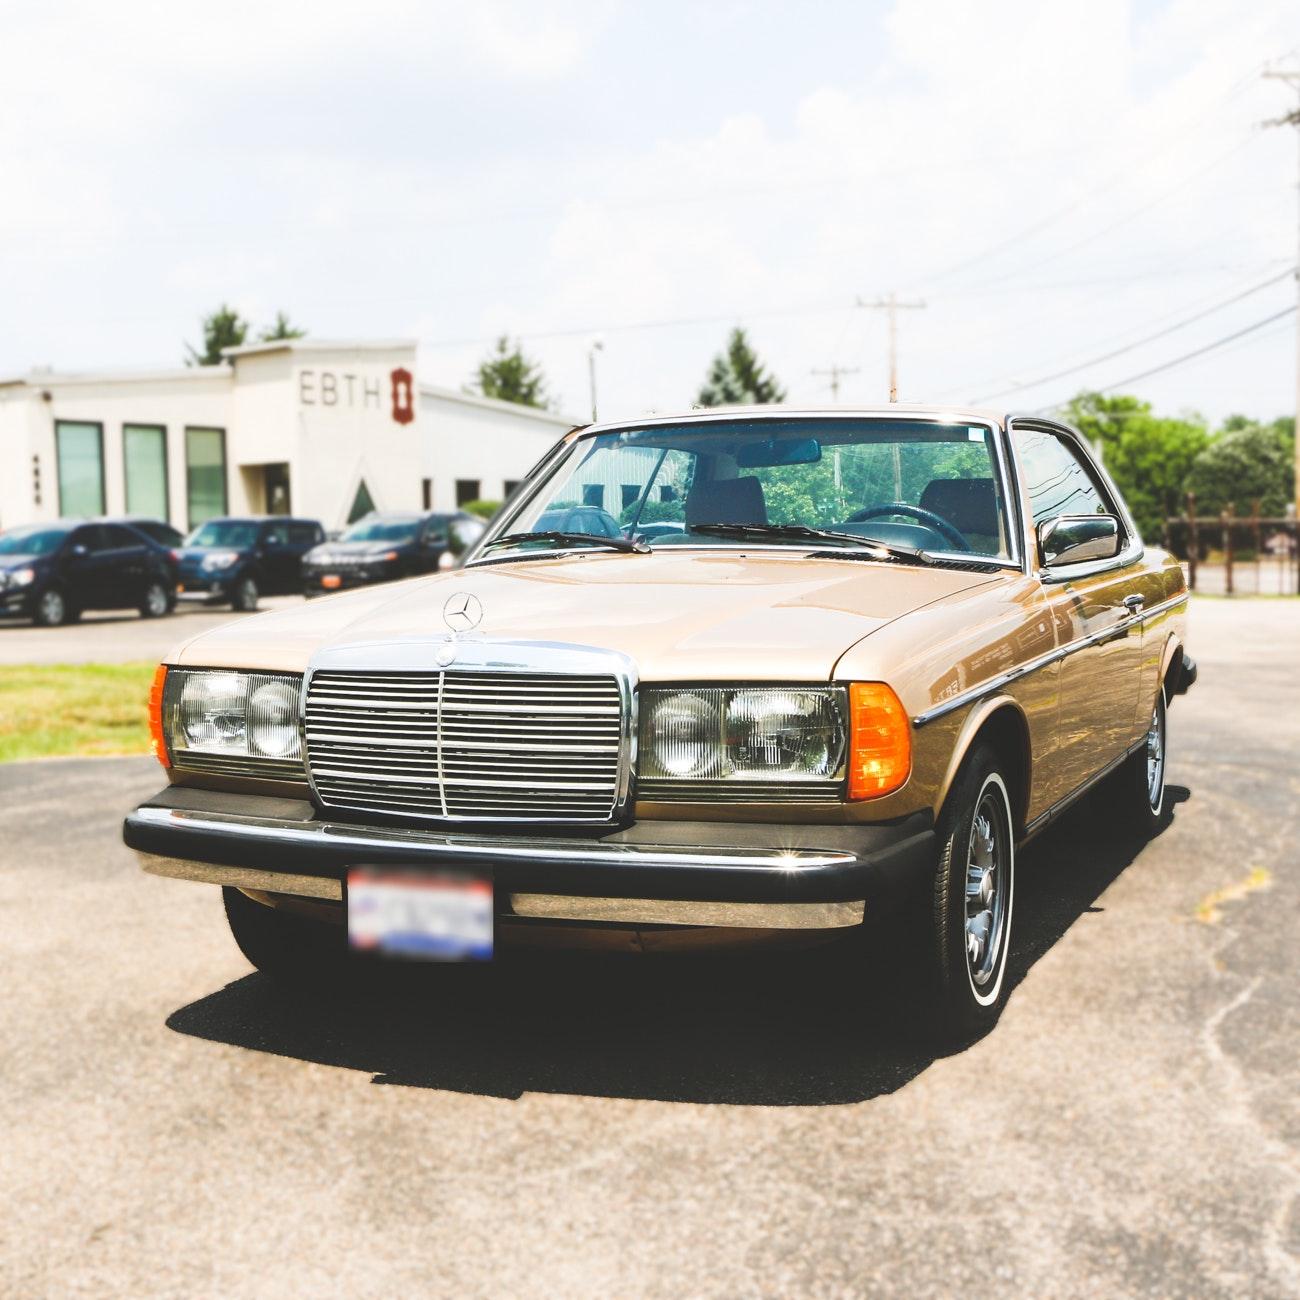 1984 Mercedes-Benz 300CD Turbo Diesel C123 Luxury Coupe